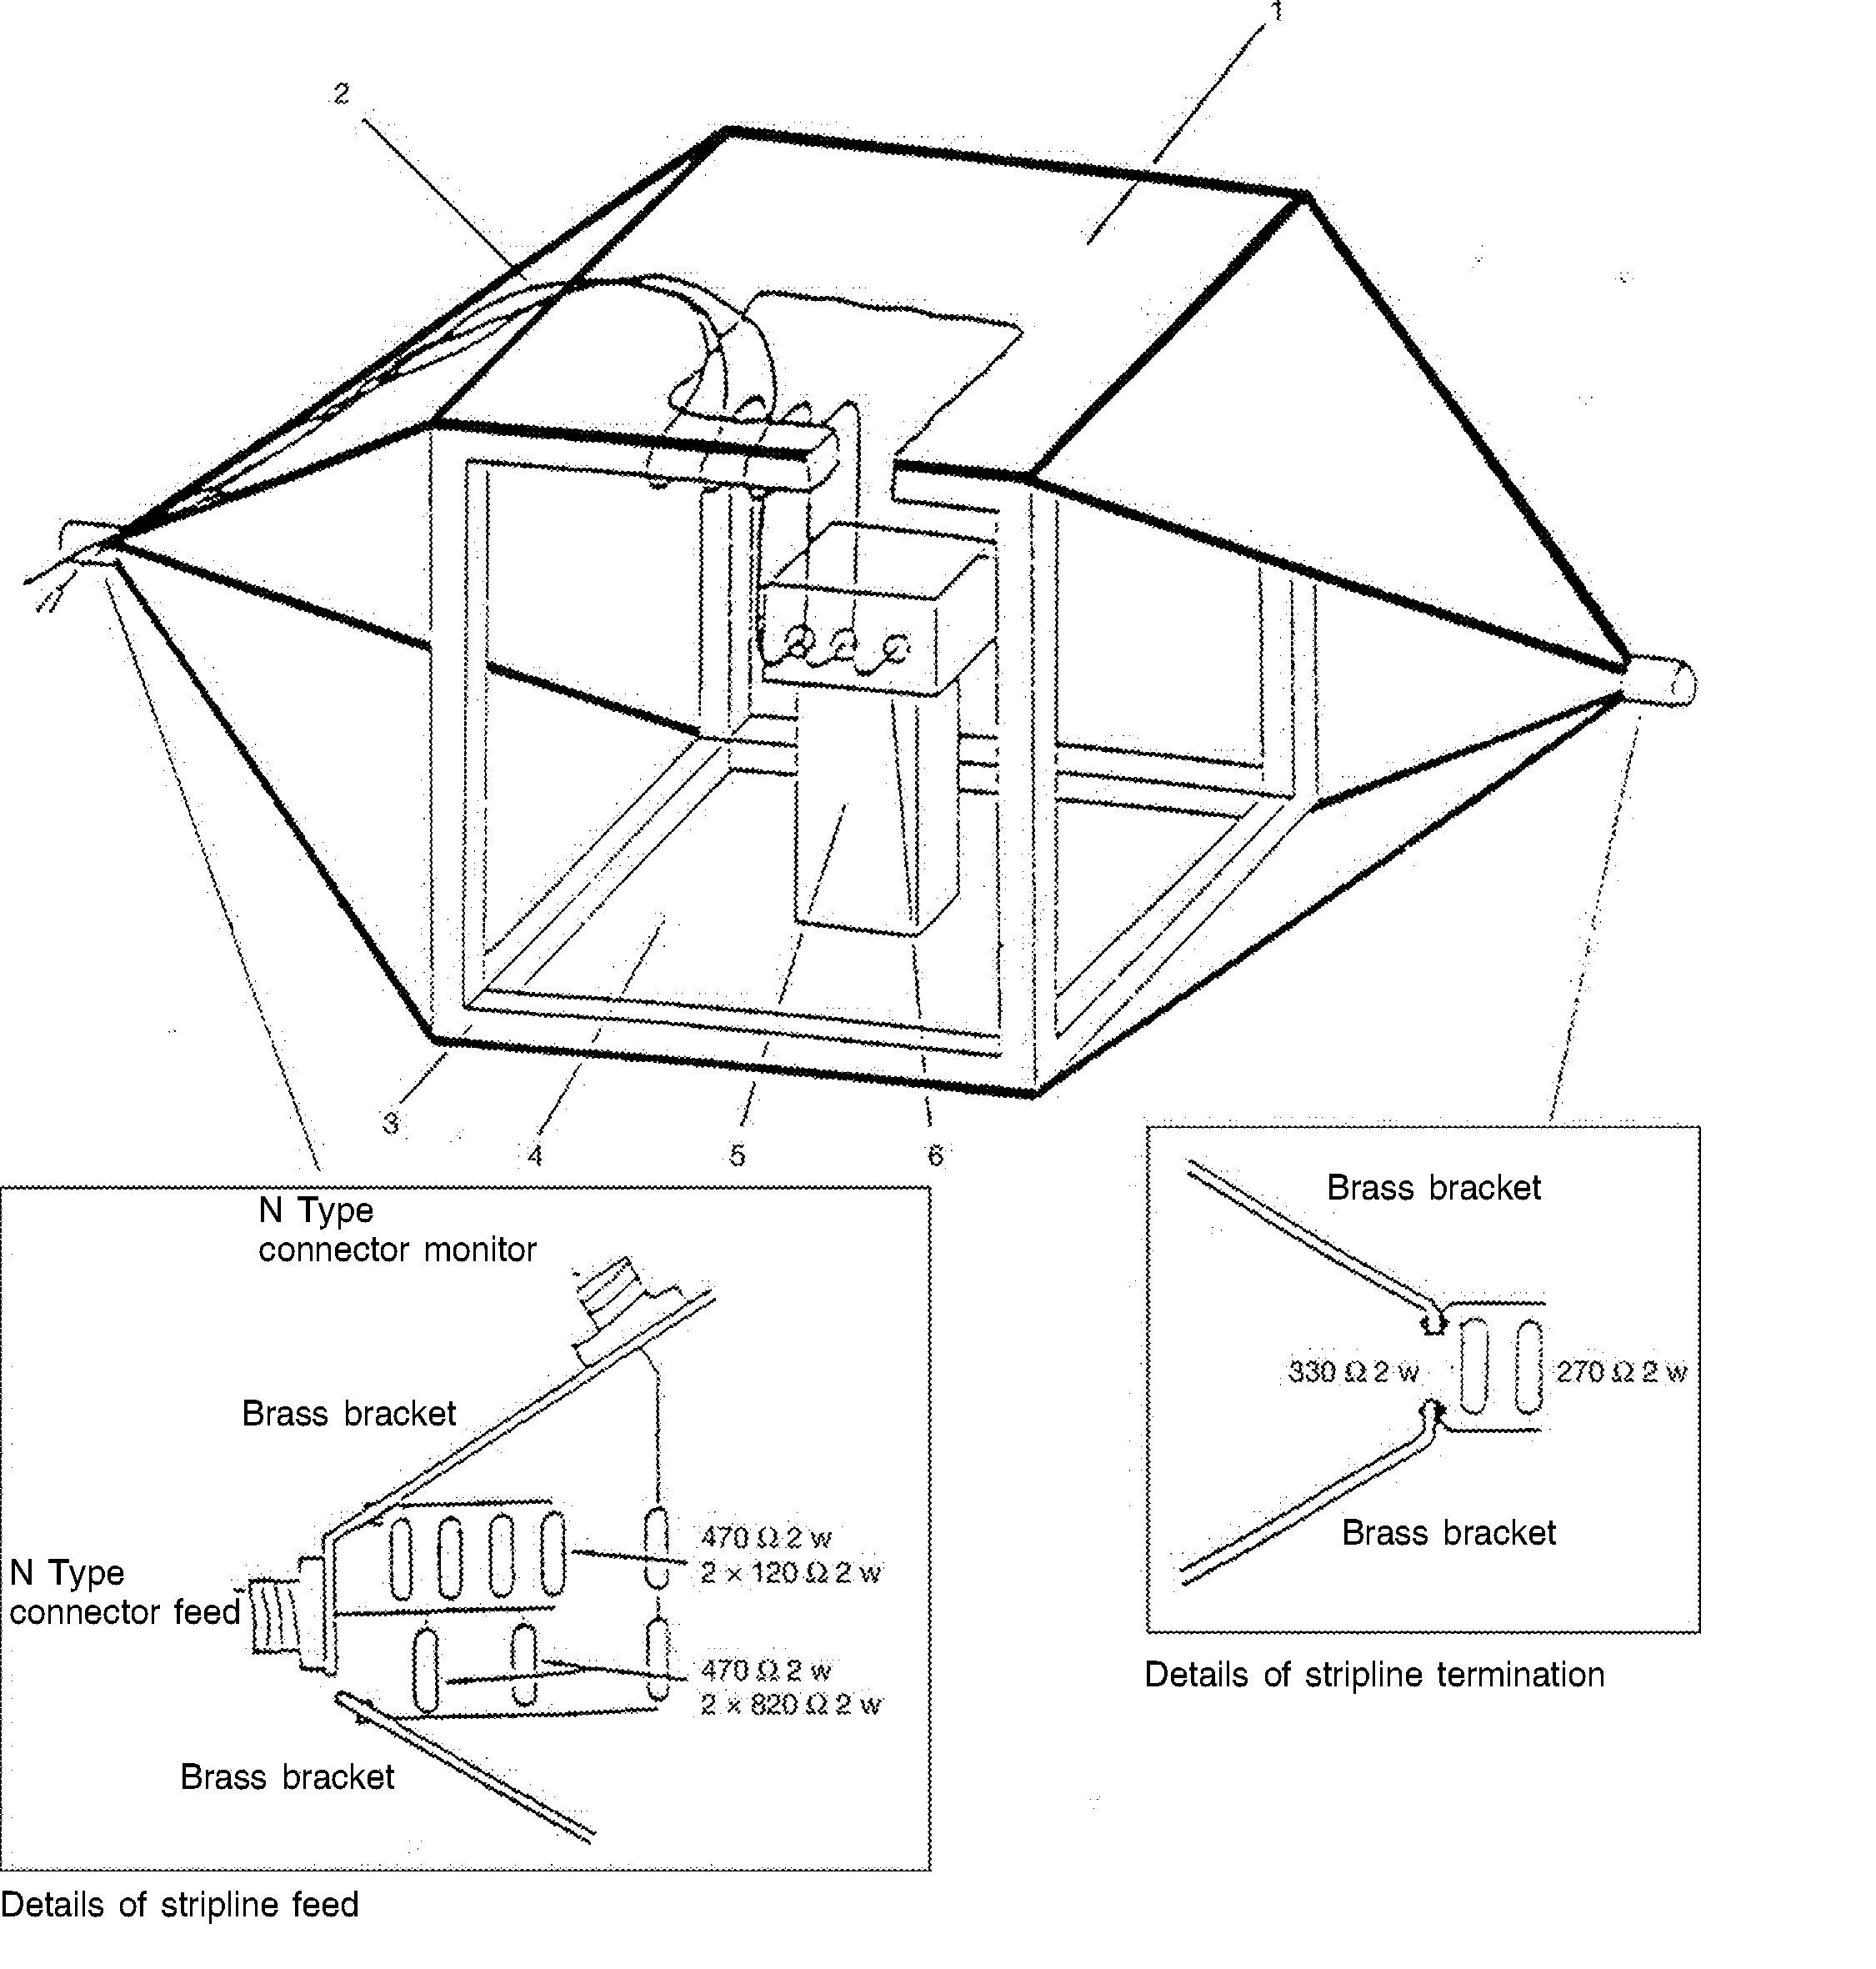 Eur Lex 02015r0208 20161014 En Aerial Lead Conn Central Wiring Harness Single Parts Housing See Image